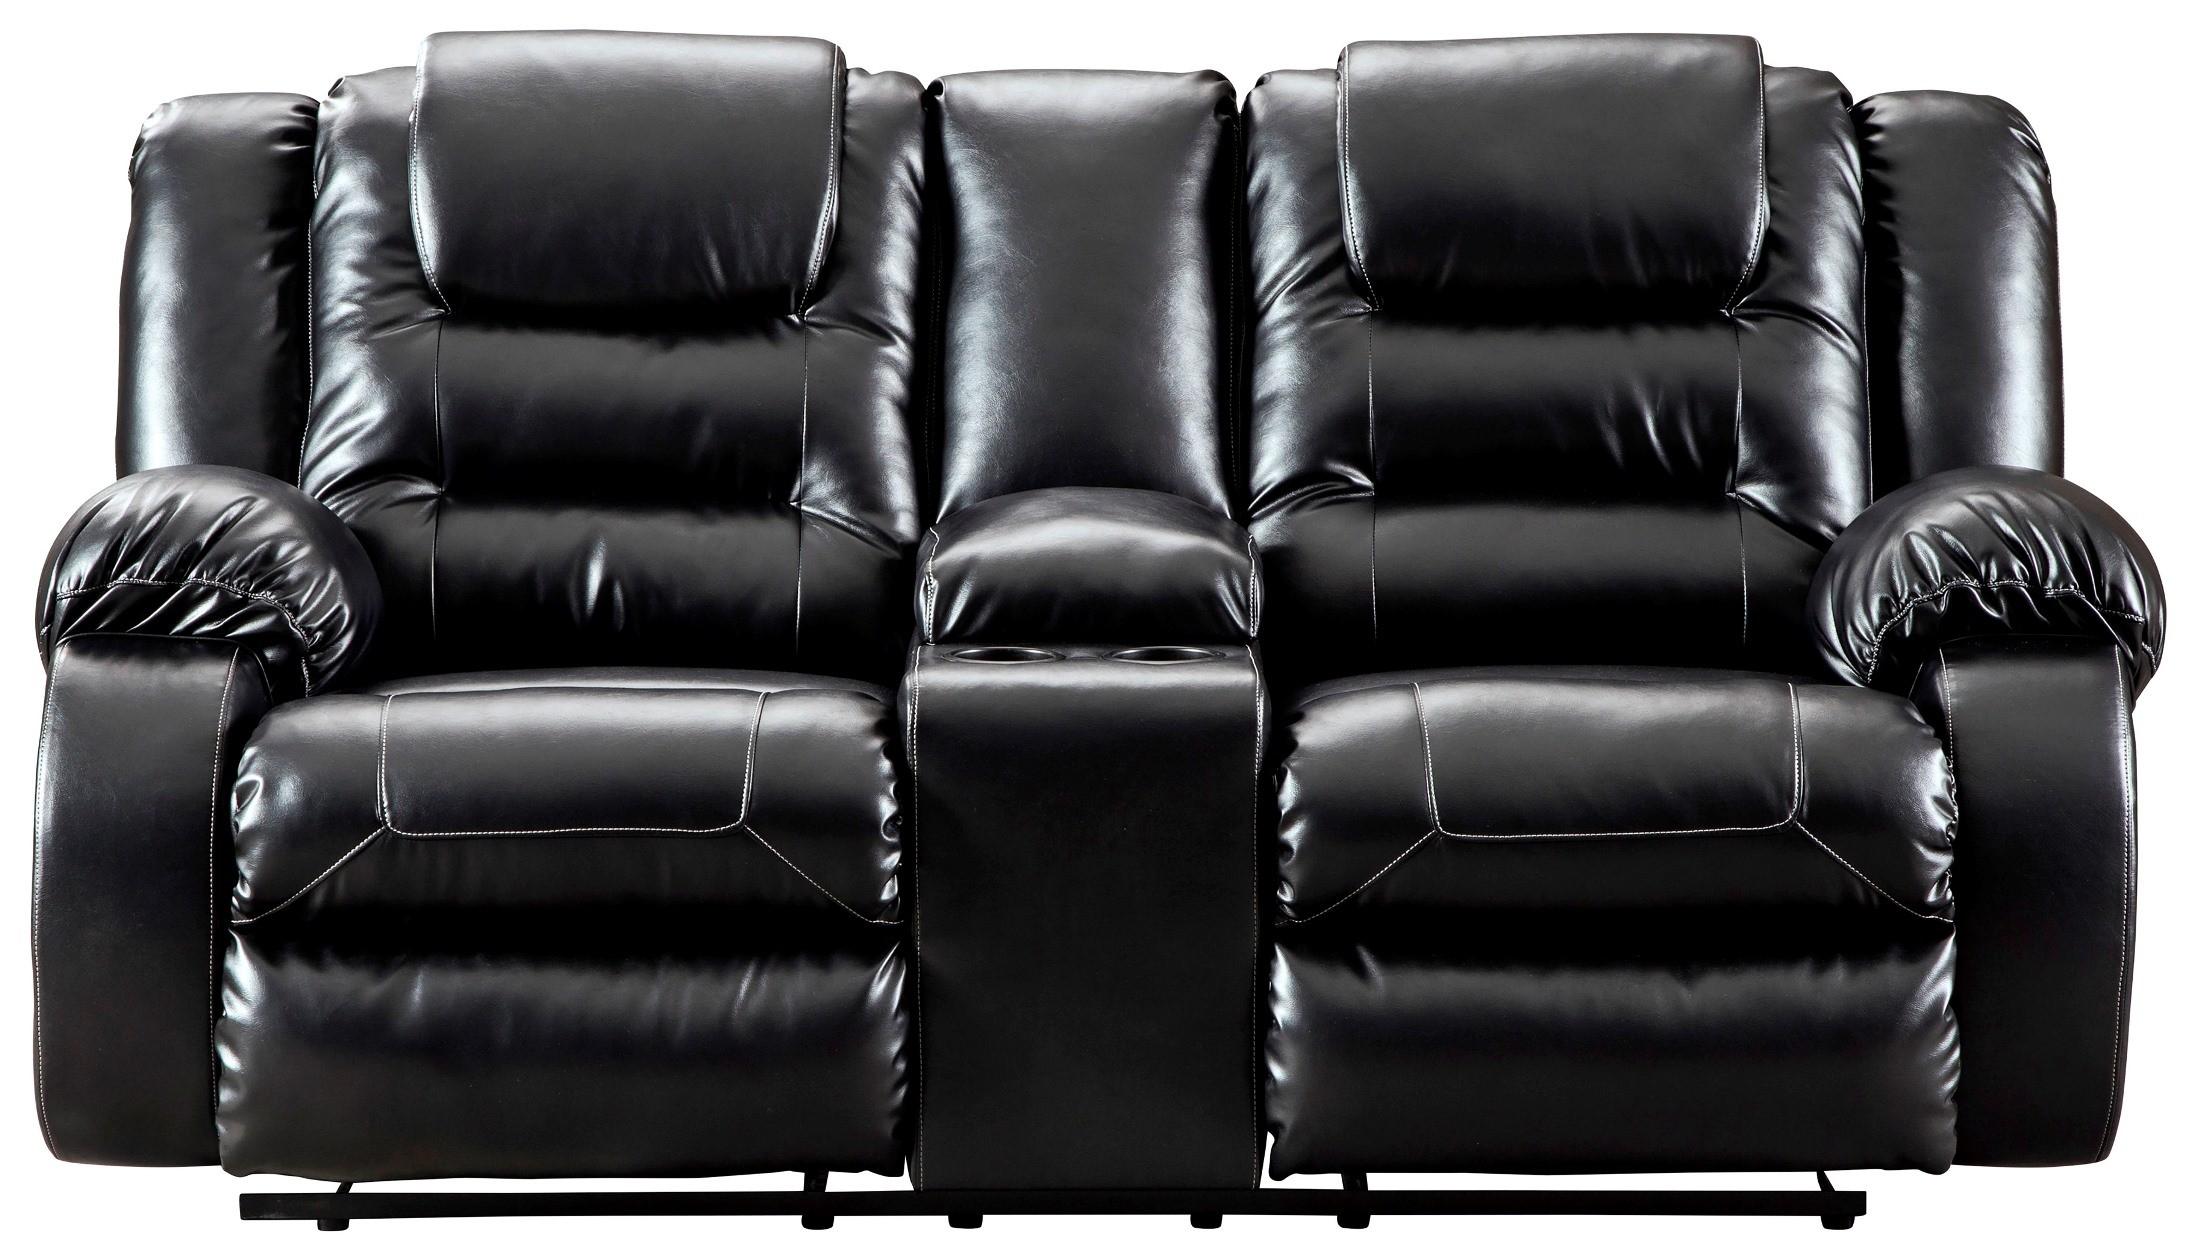 latitude pdx reviews run wayfair recliner furniture reclining double wagnon loveseat